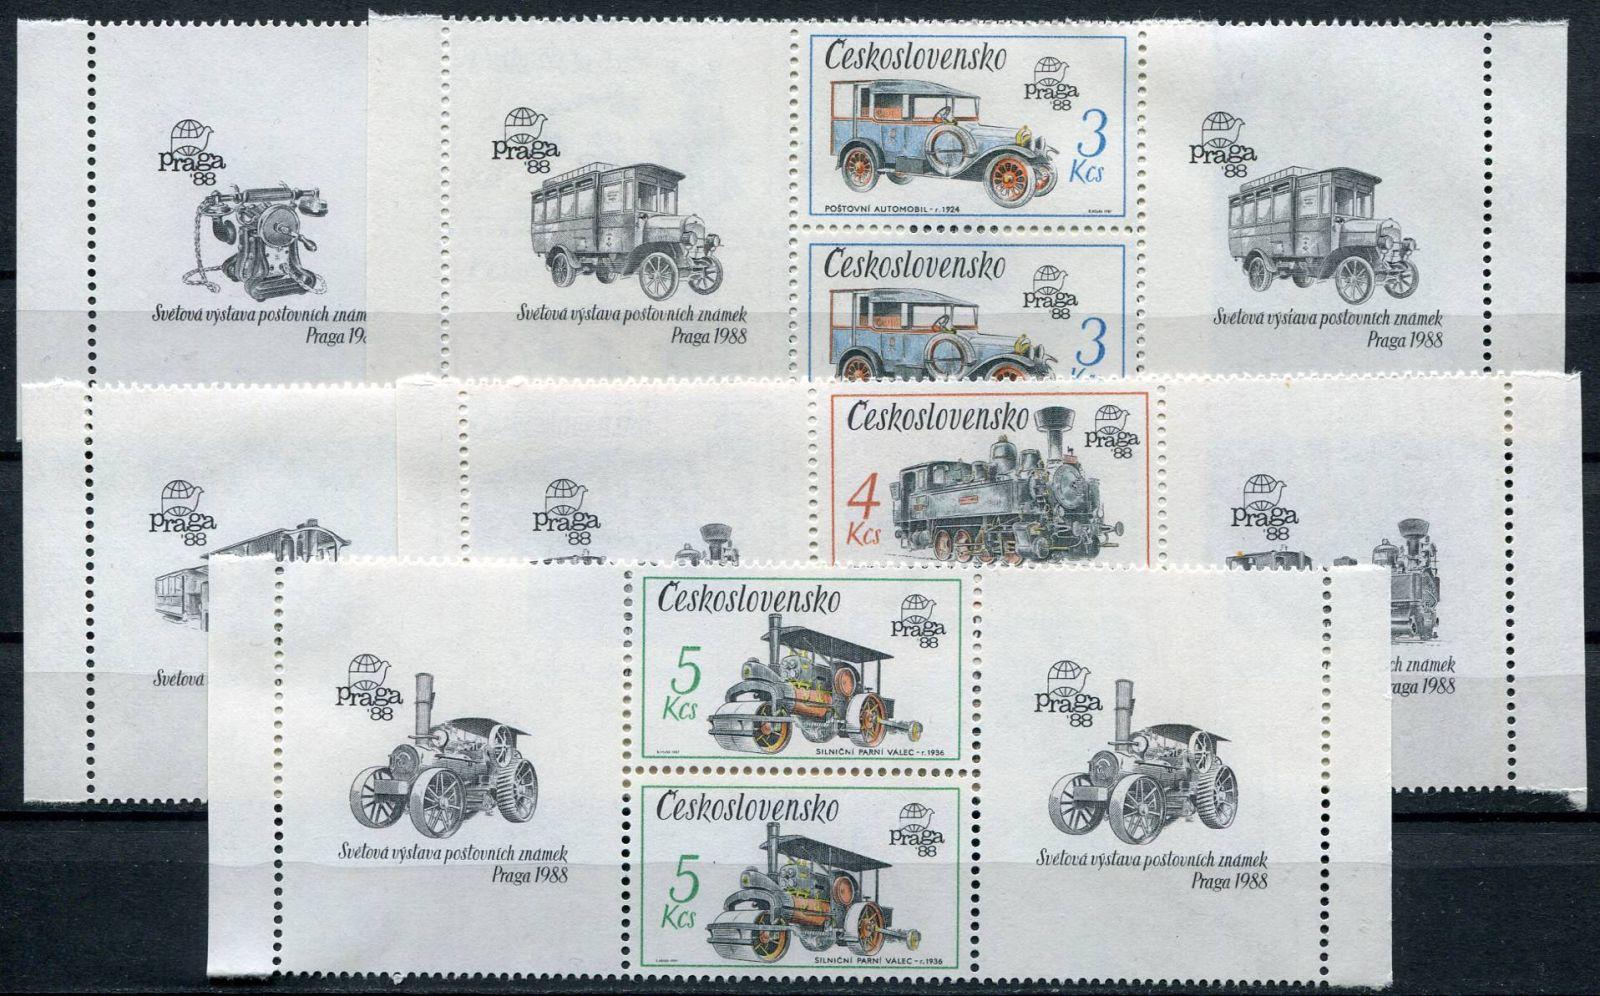 (1987) č. 2794 - 2798 ** - S - Československo - Technické památky ČSSR   www.tgw.cz